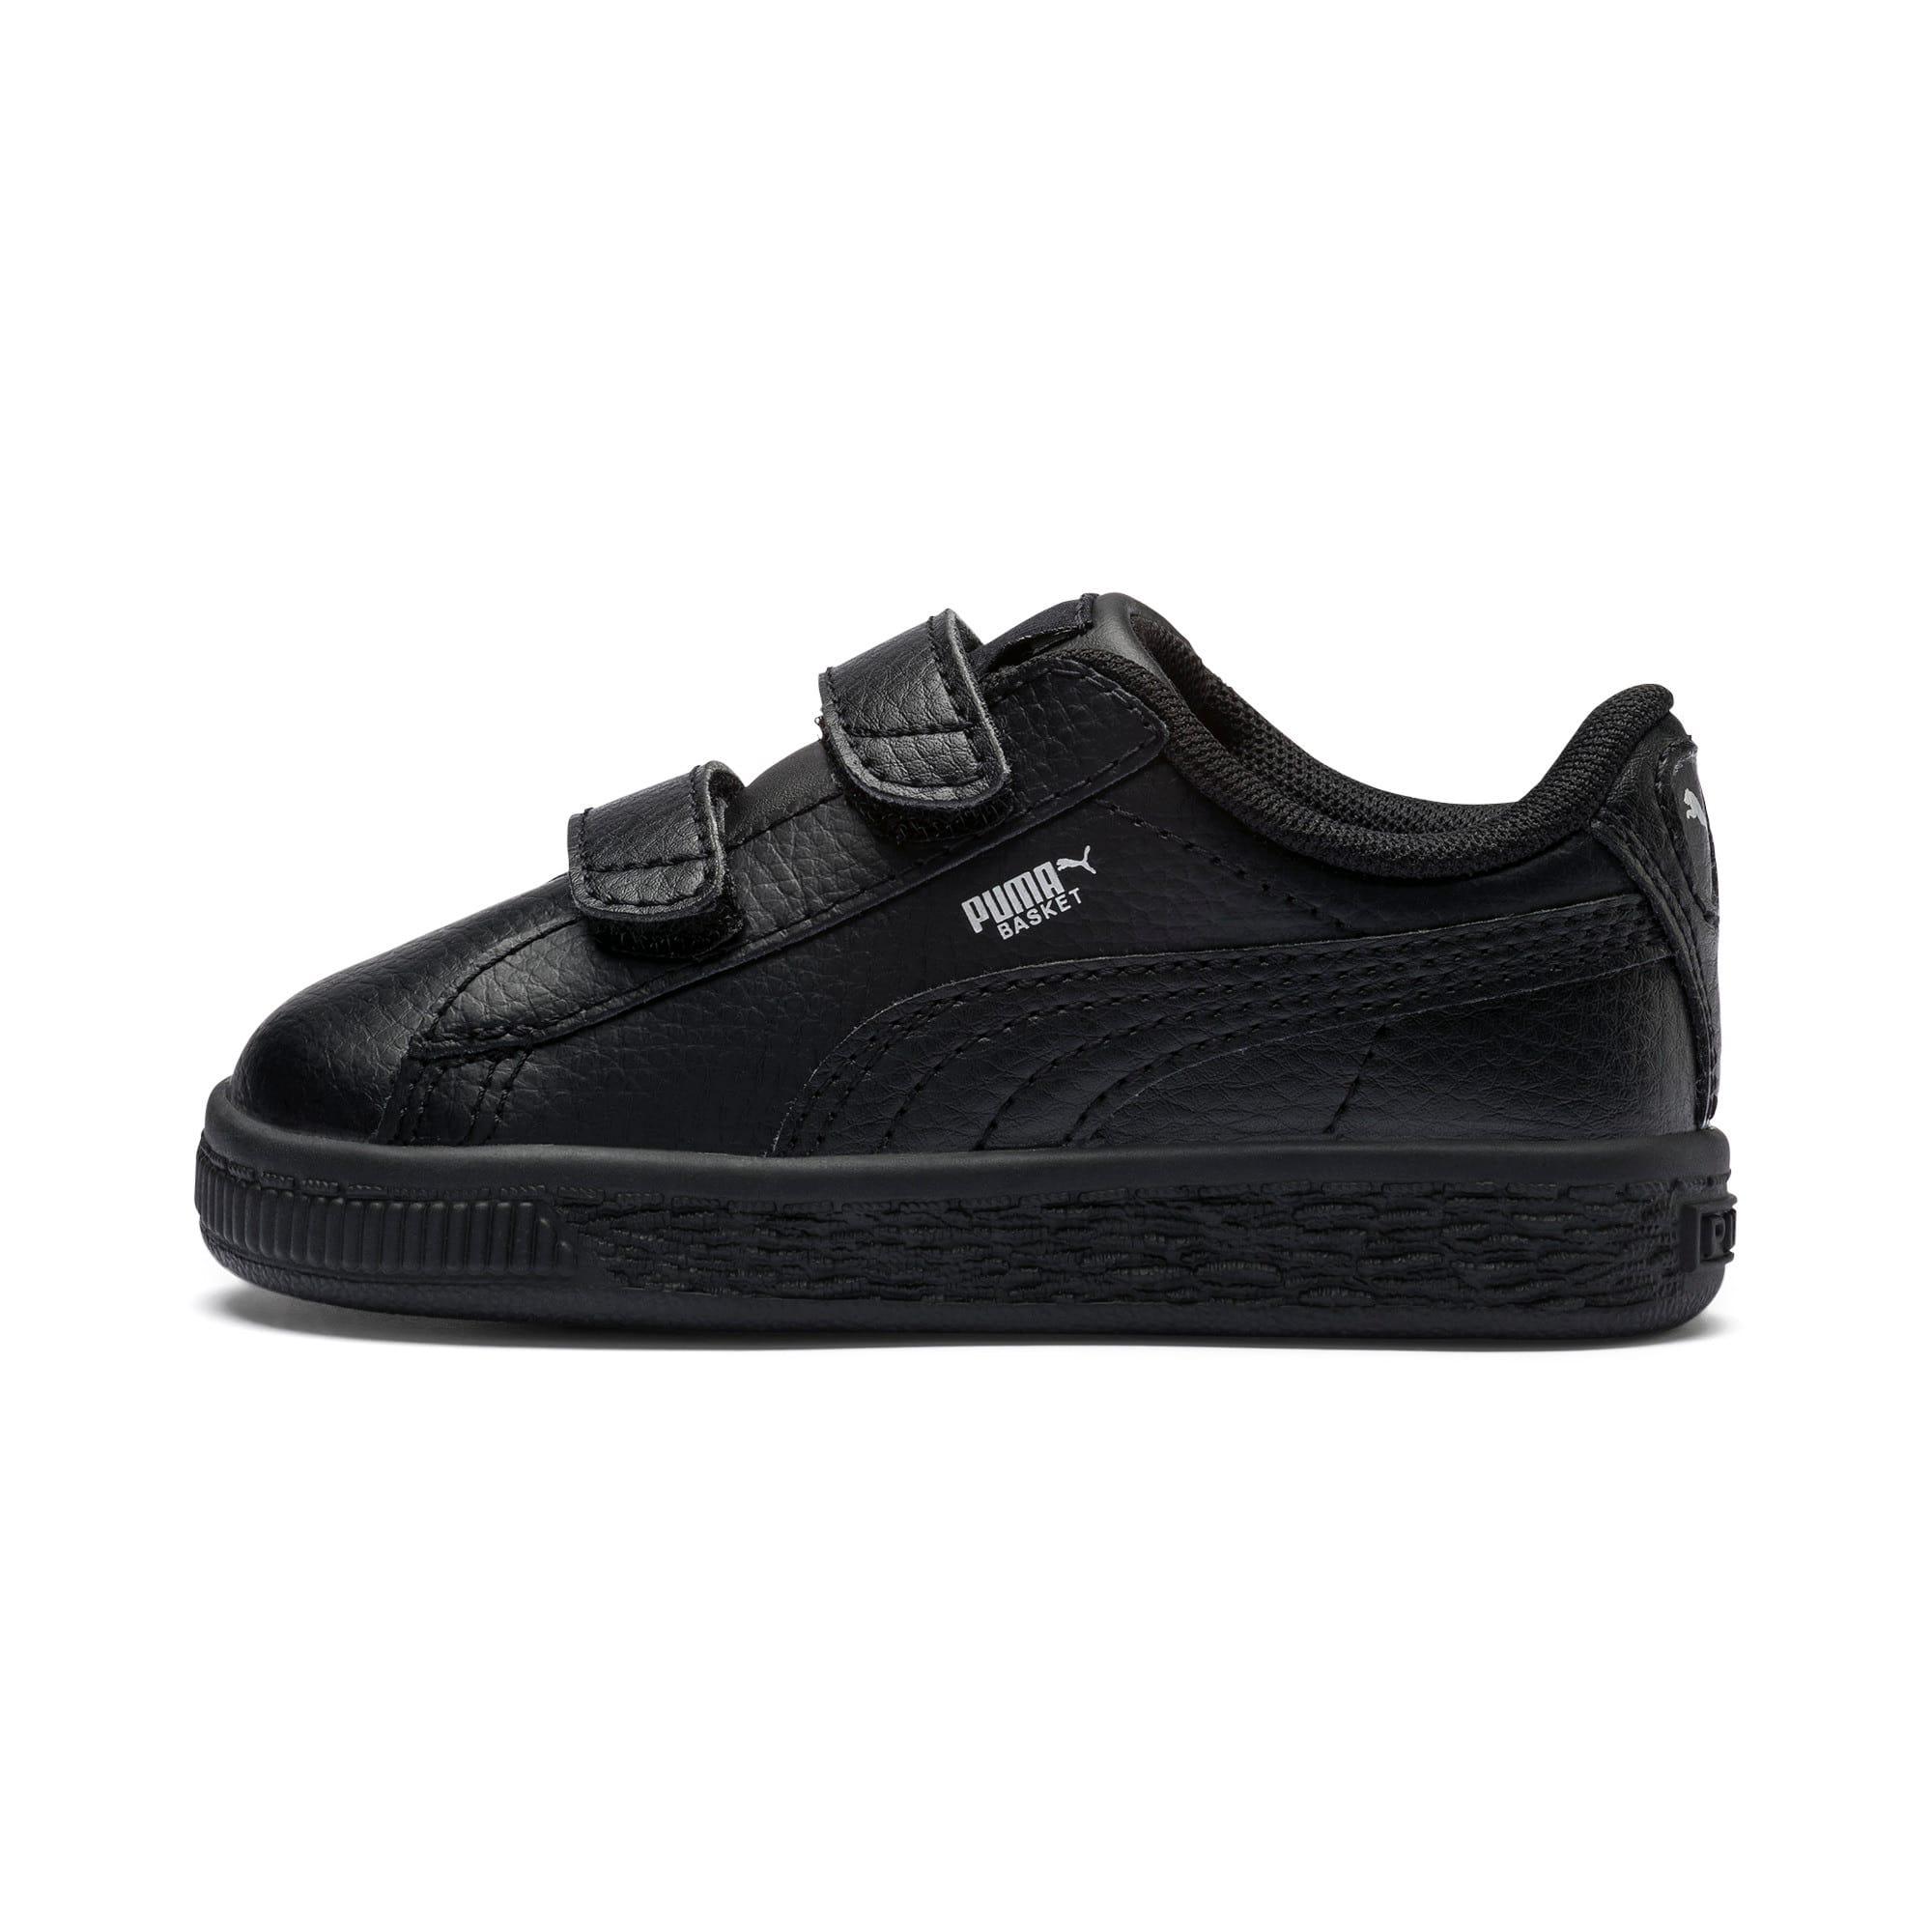 Thumbnail 1 of Basket Classic AC Toddler Shoes, Puma Black-Puma Black, medium